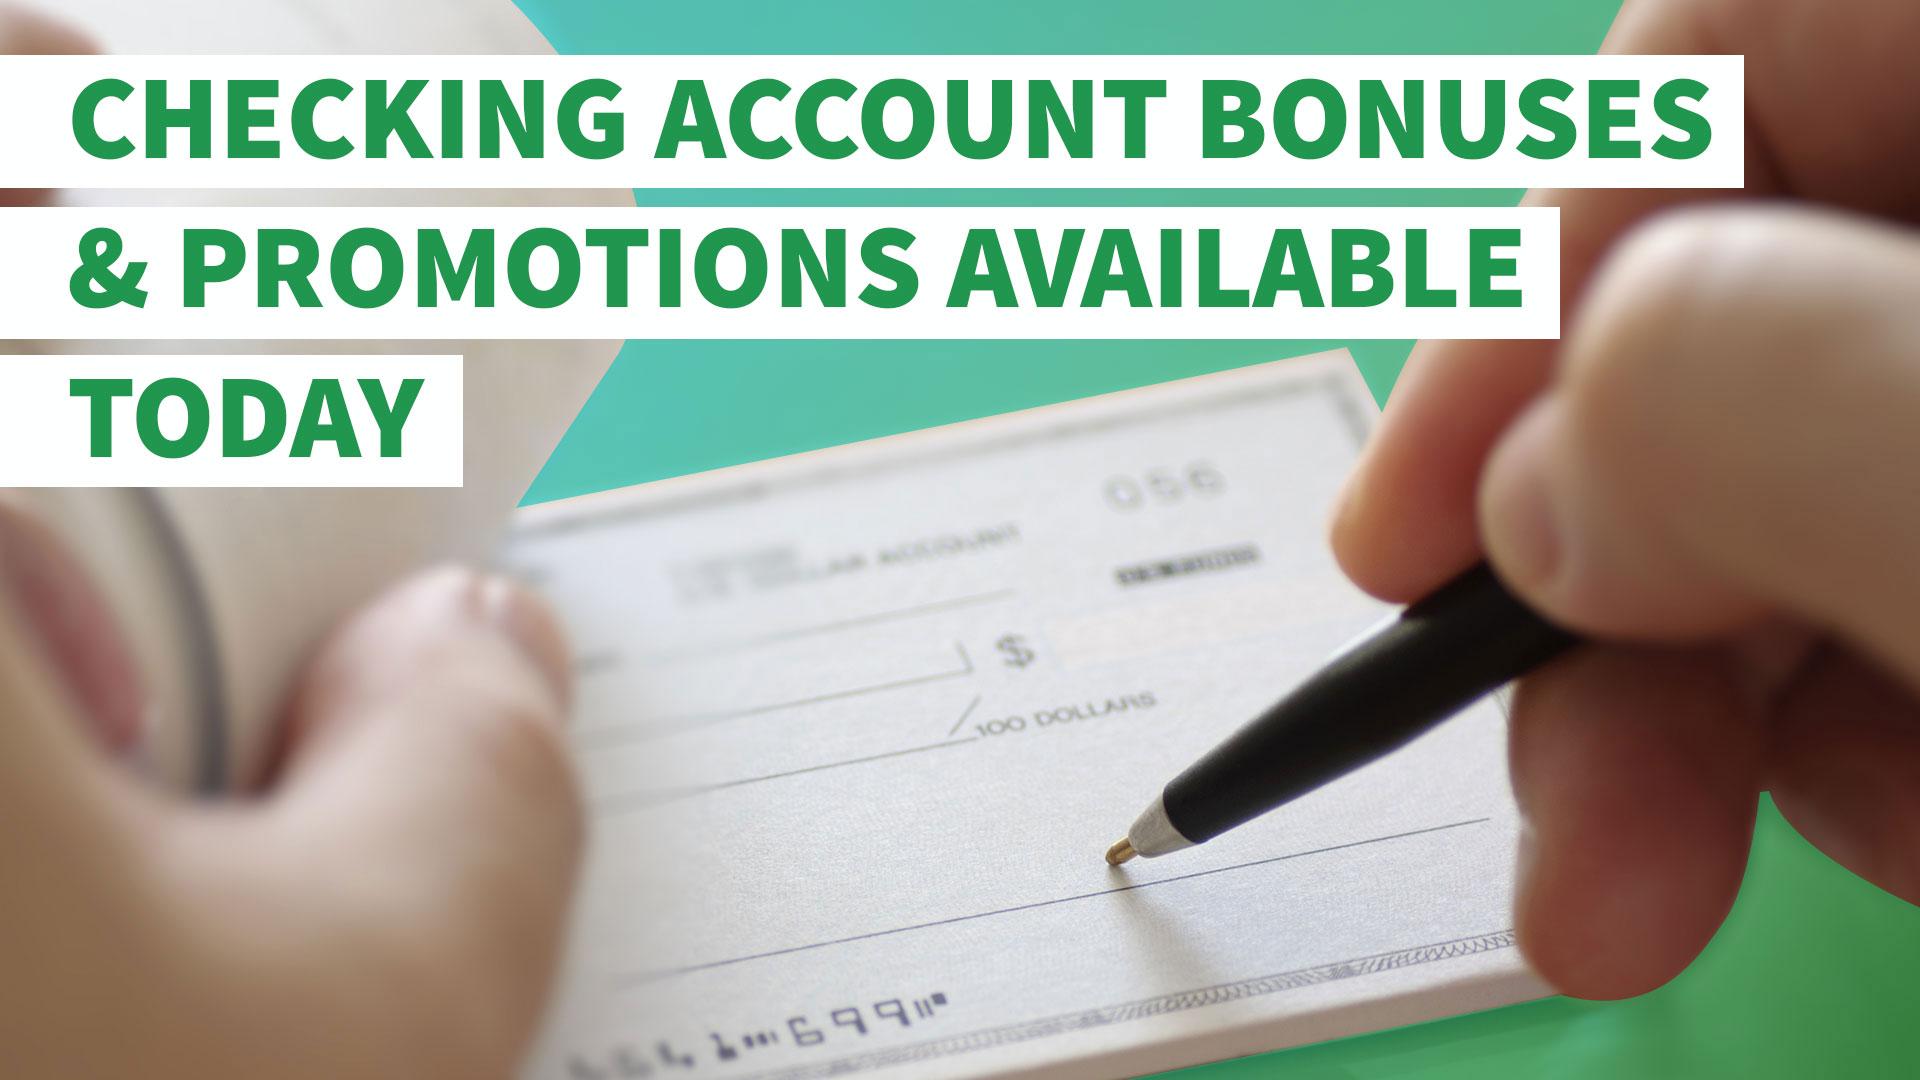 new checking account bonus bank of america